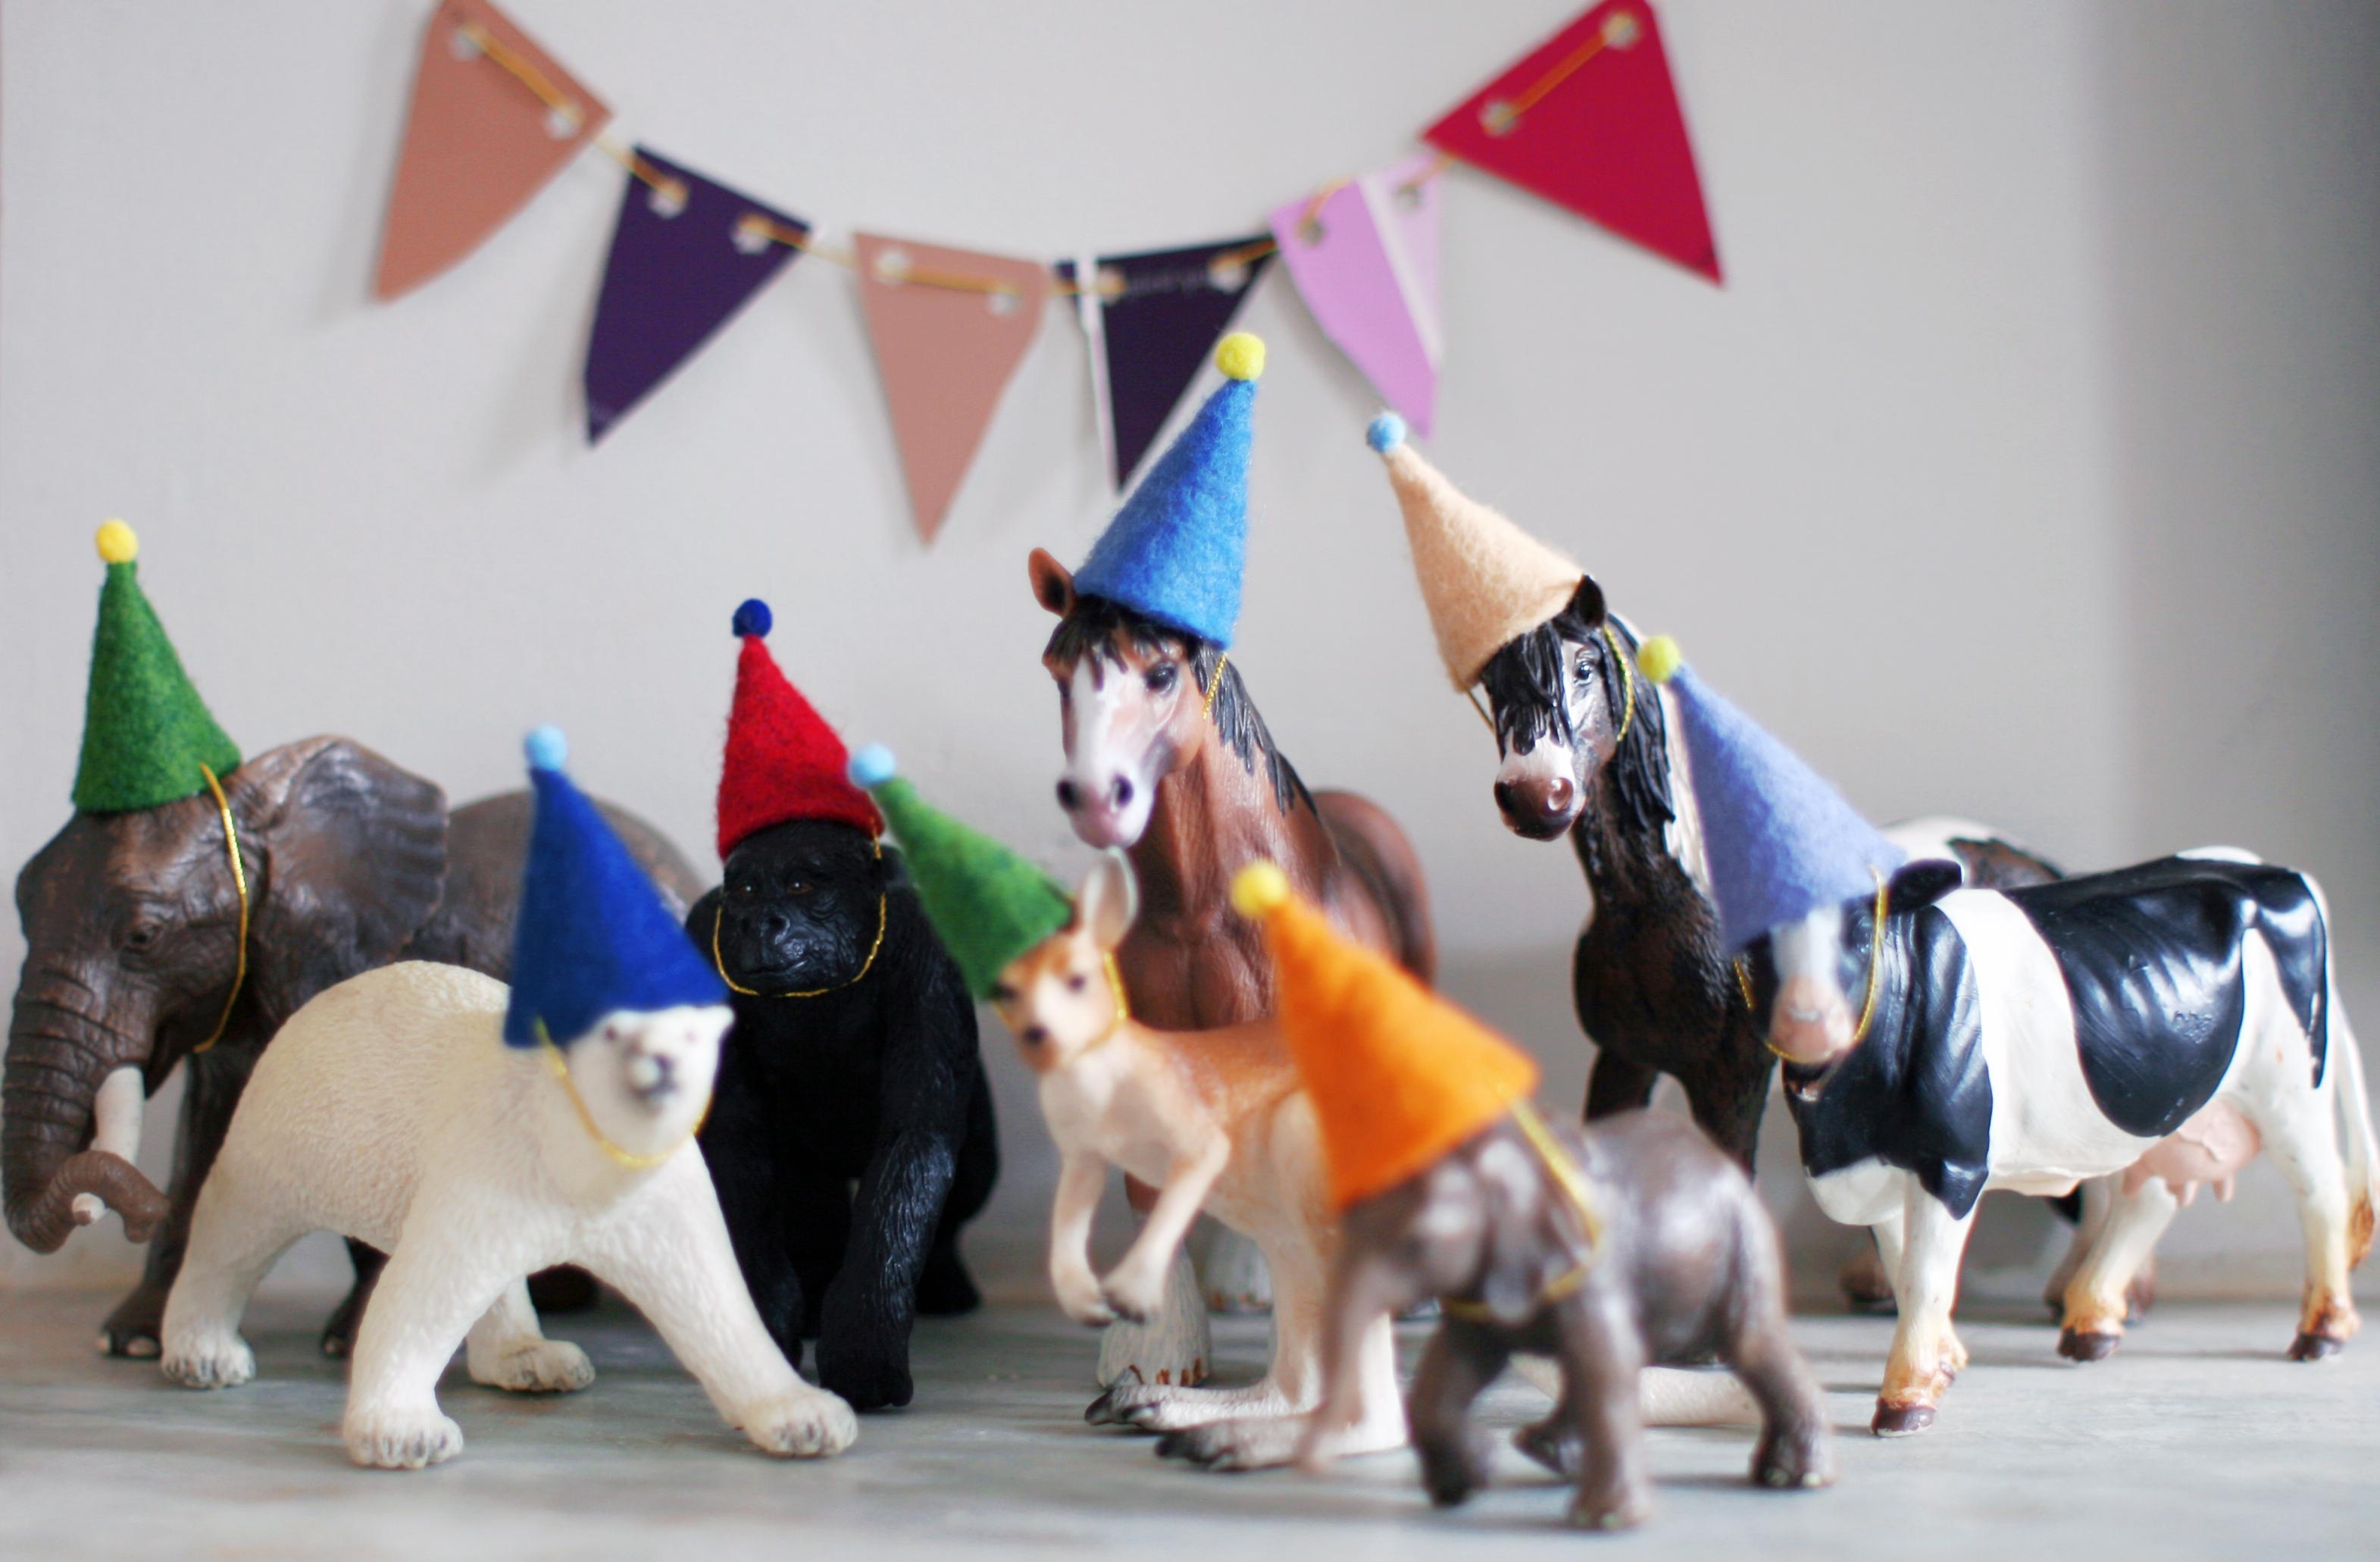 PartyAnimials1 Hat3 Hat2 Hat a79476ad07d2